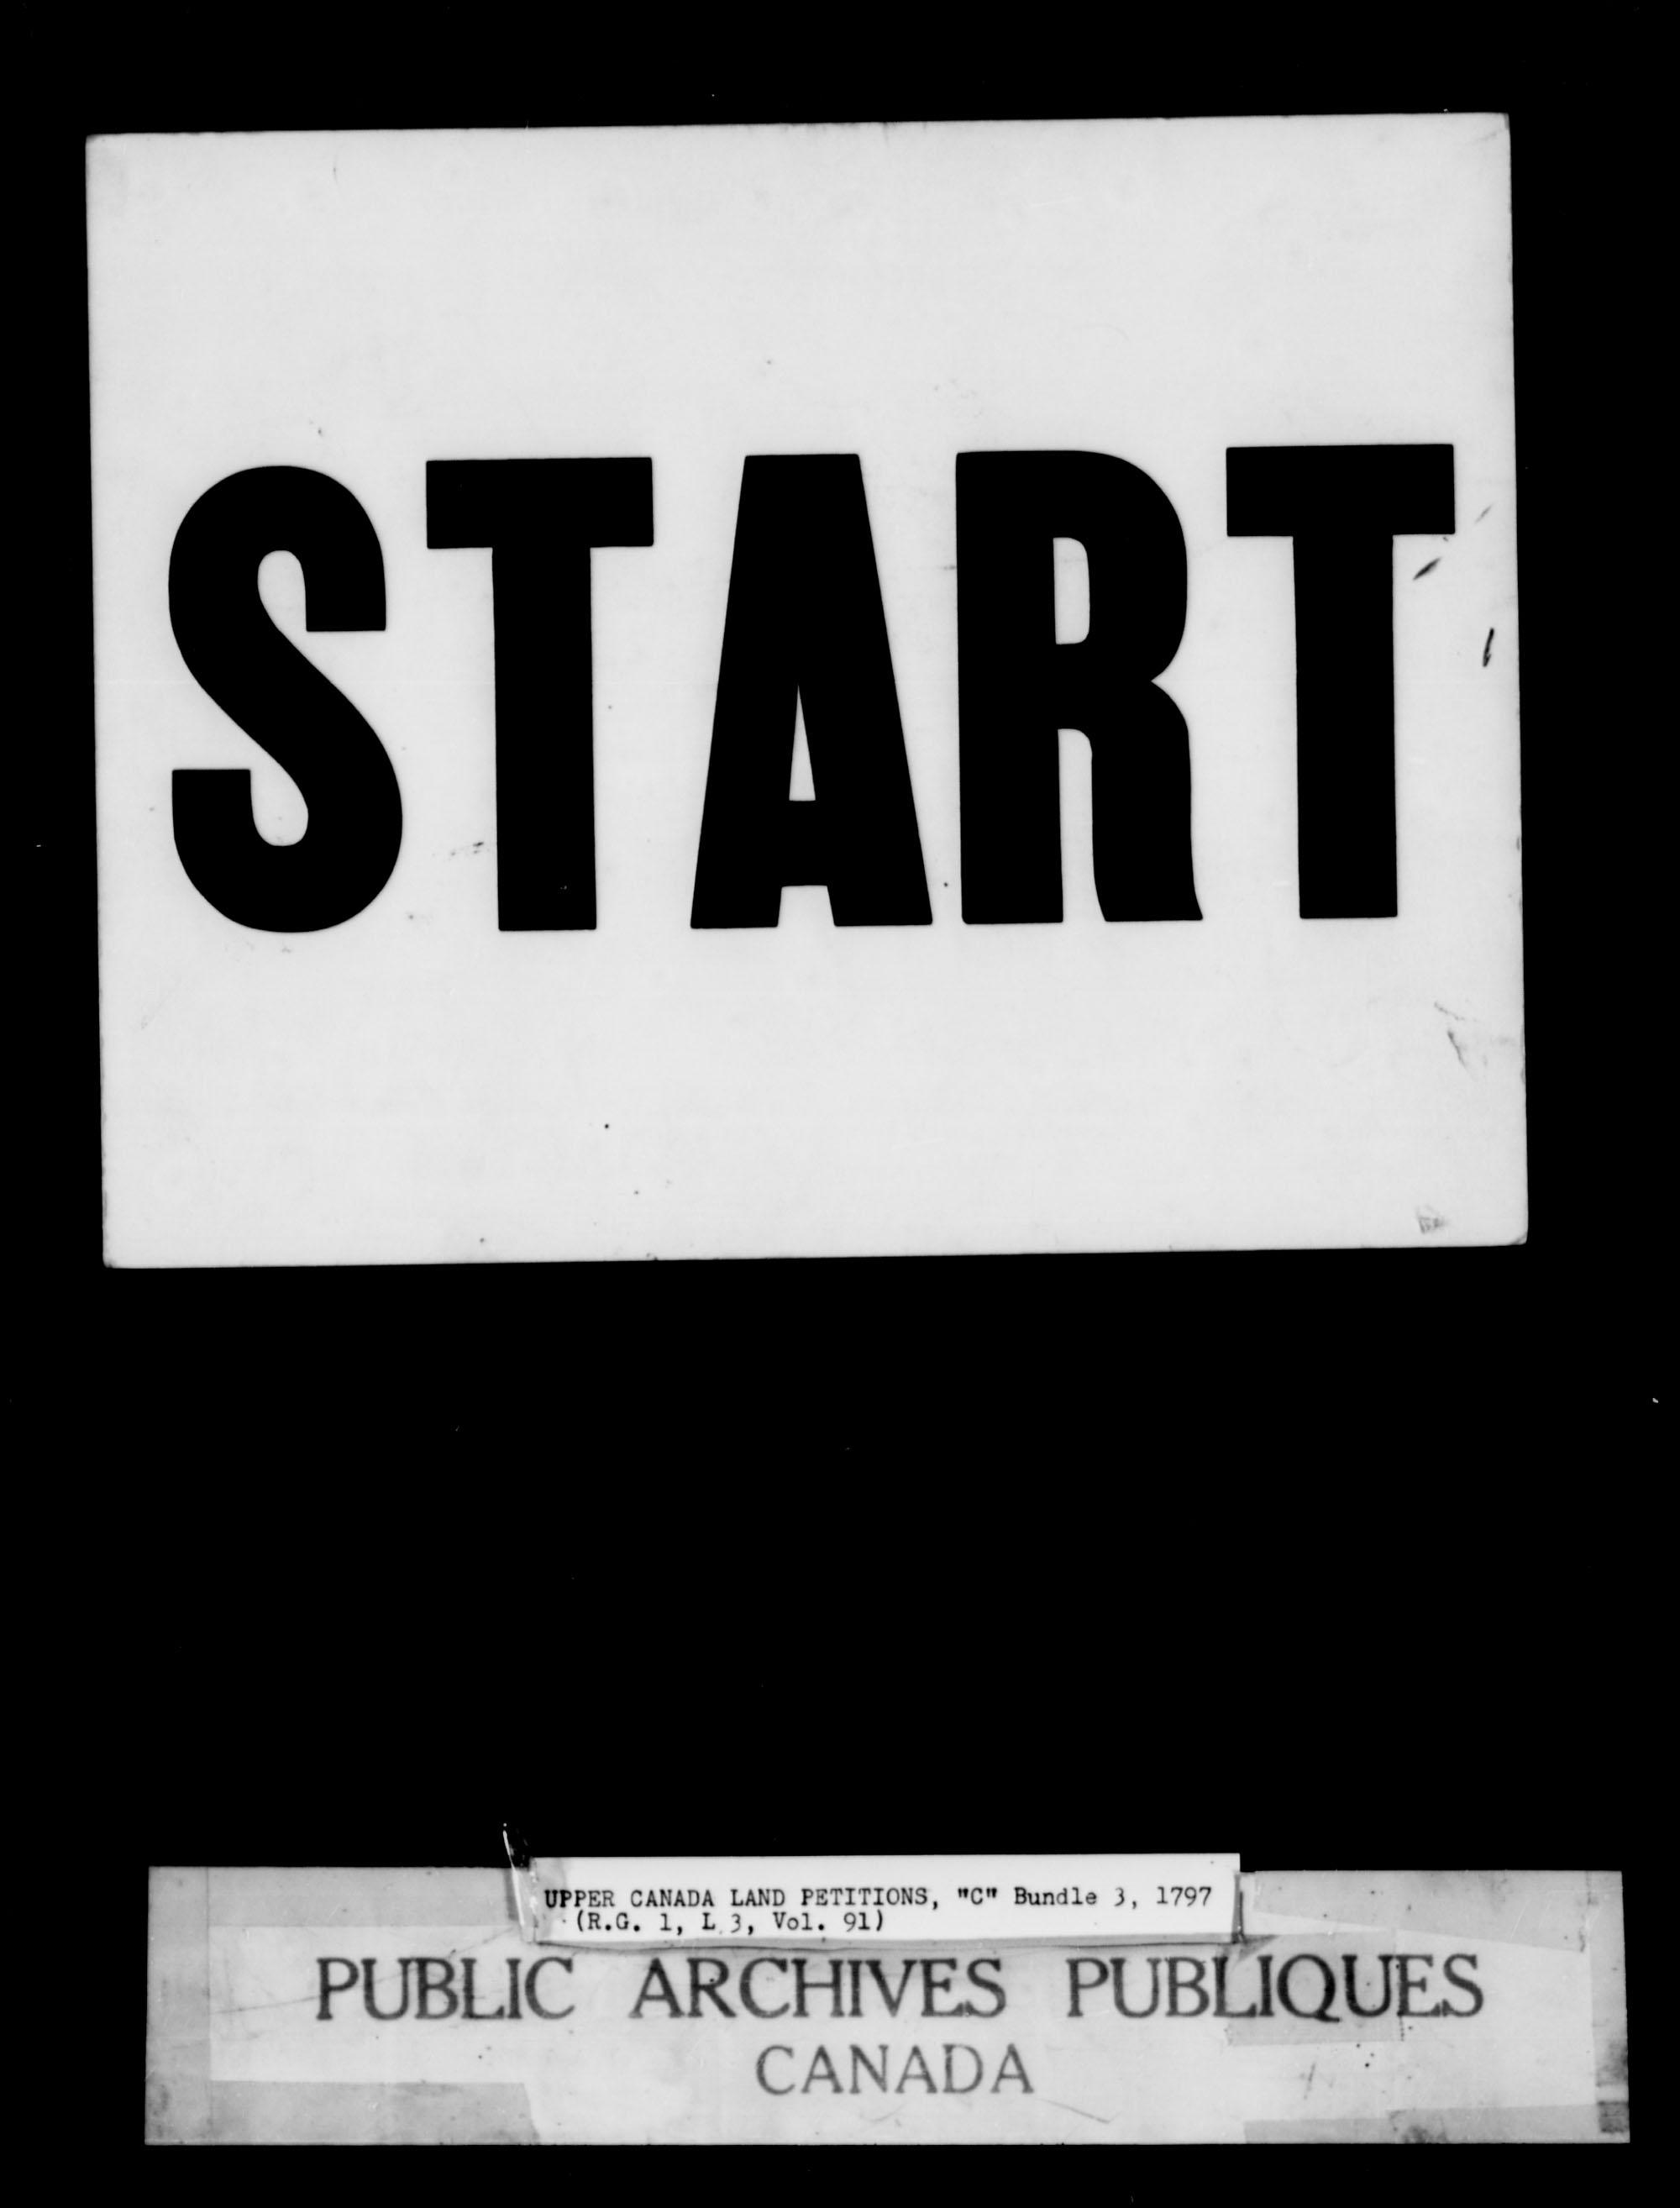 Titre: Demandes de terres du Haut-Canada (1763-1865) - N° d'enregistrement Mikan: 205131 - Microforme: c-1648